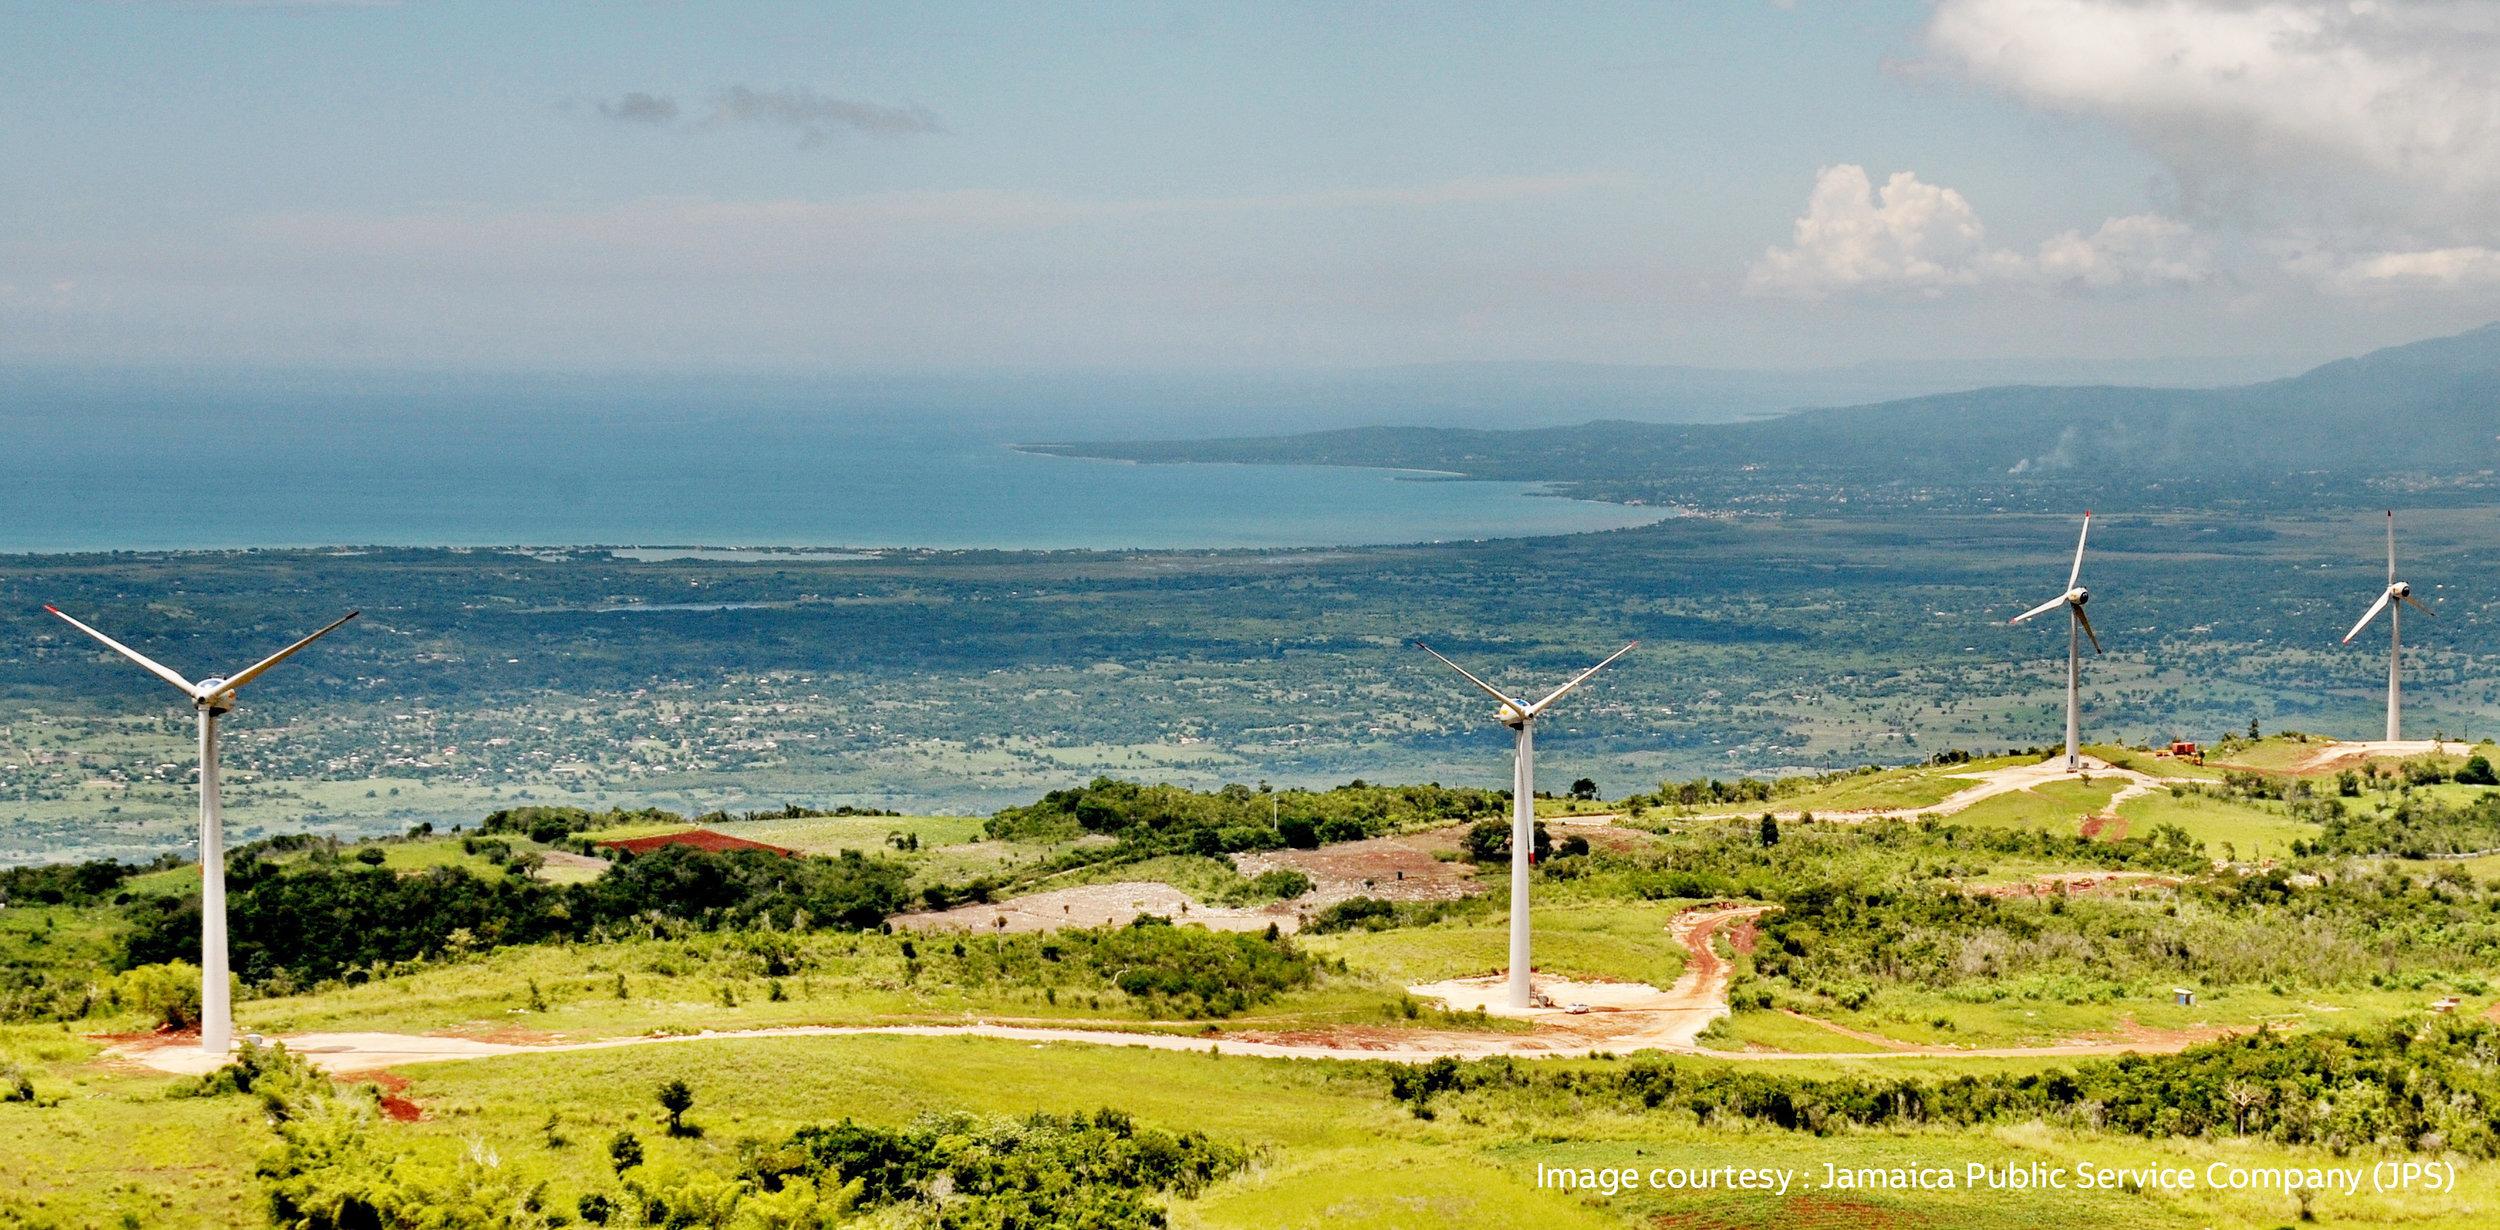 Munro Wind Farm in St. Elizabeth Jamaica (© Jamaica Public Service Company (JPS))